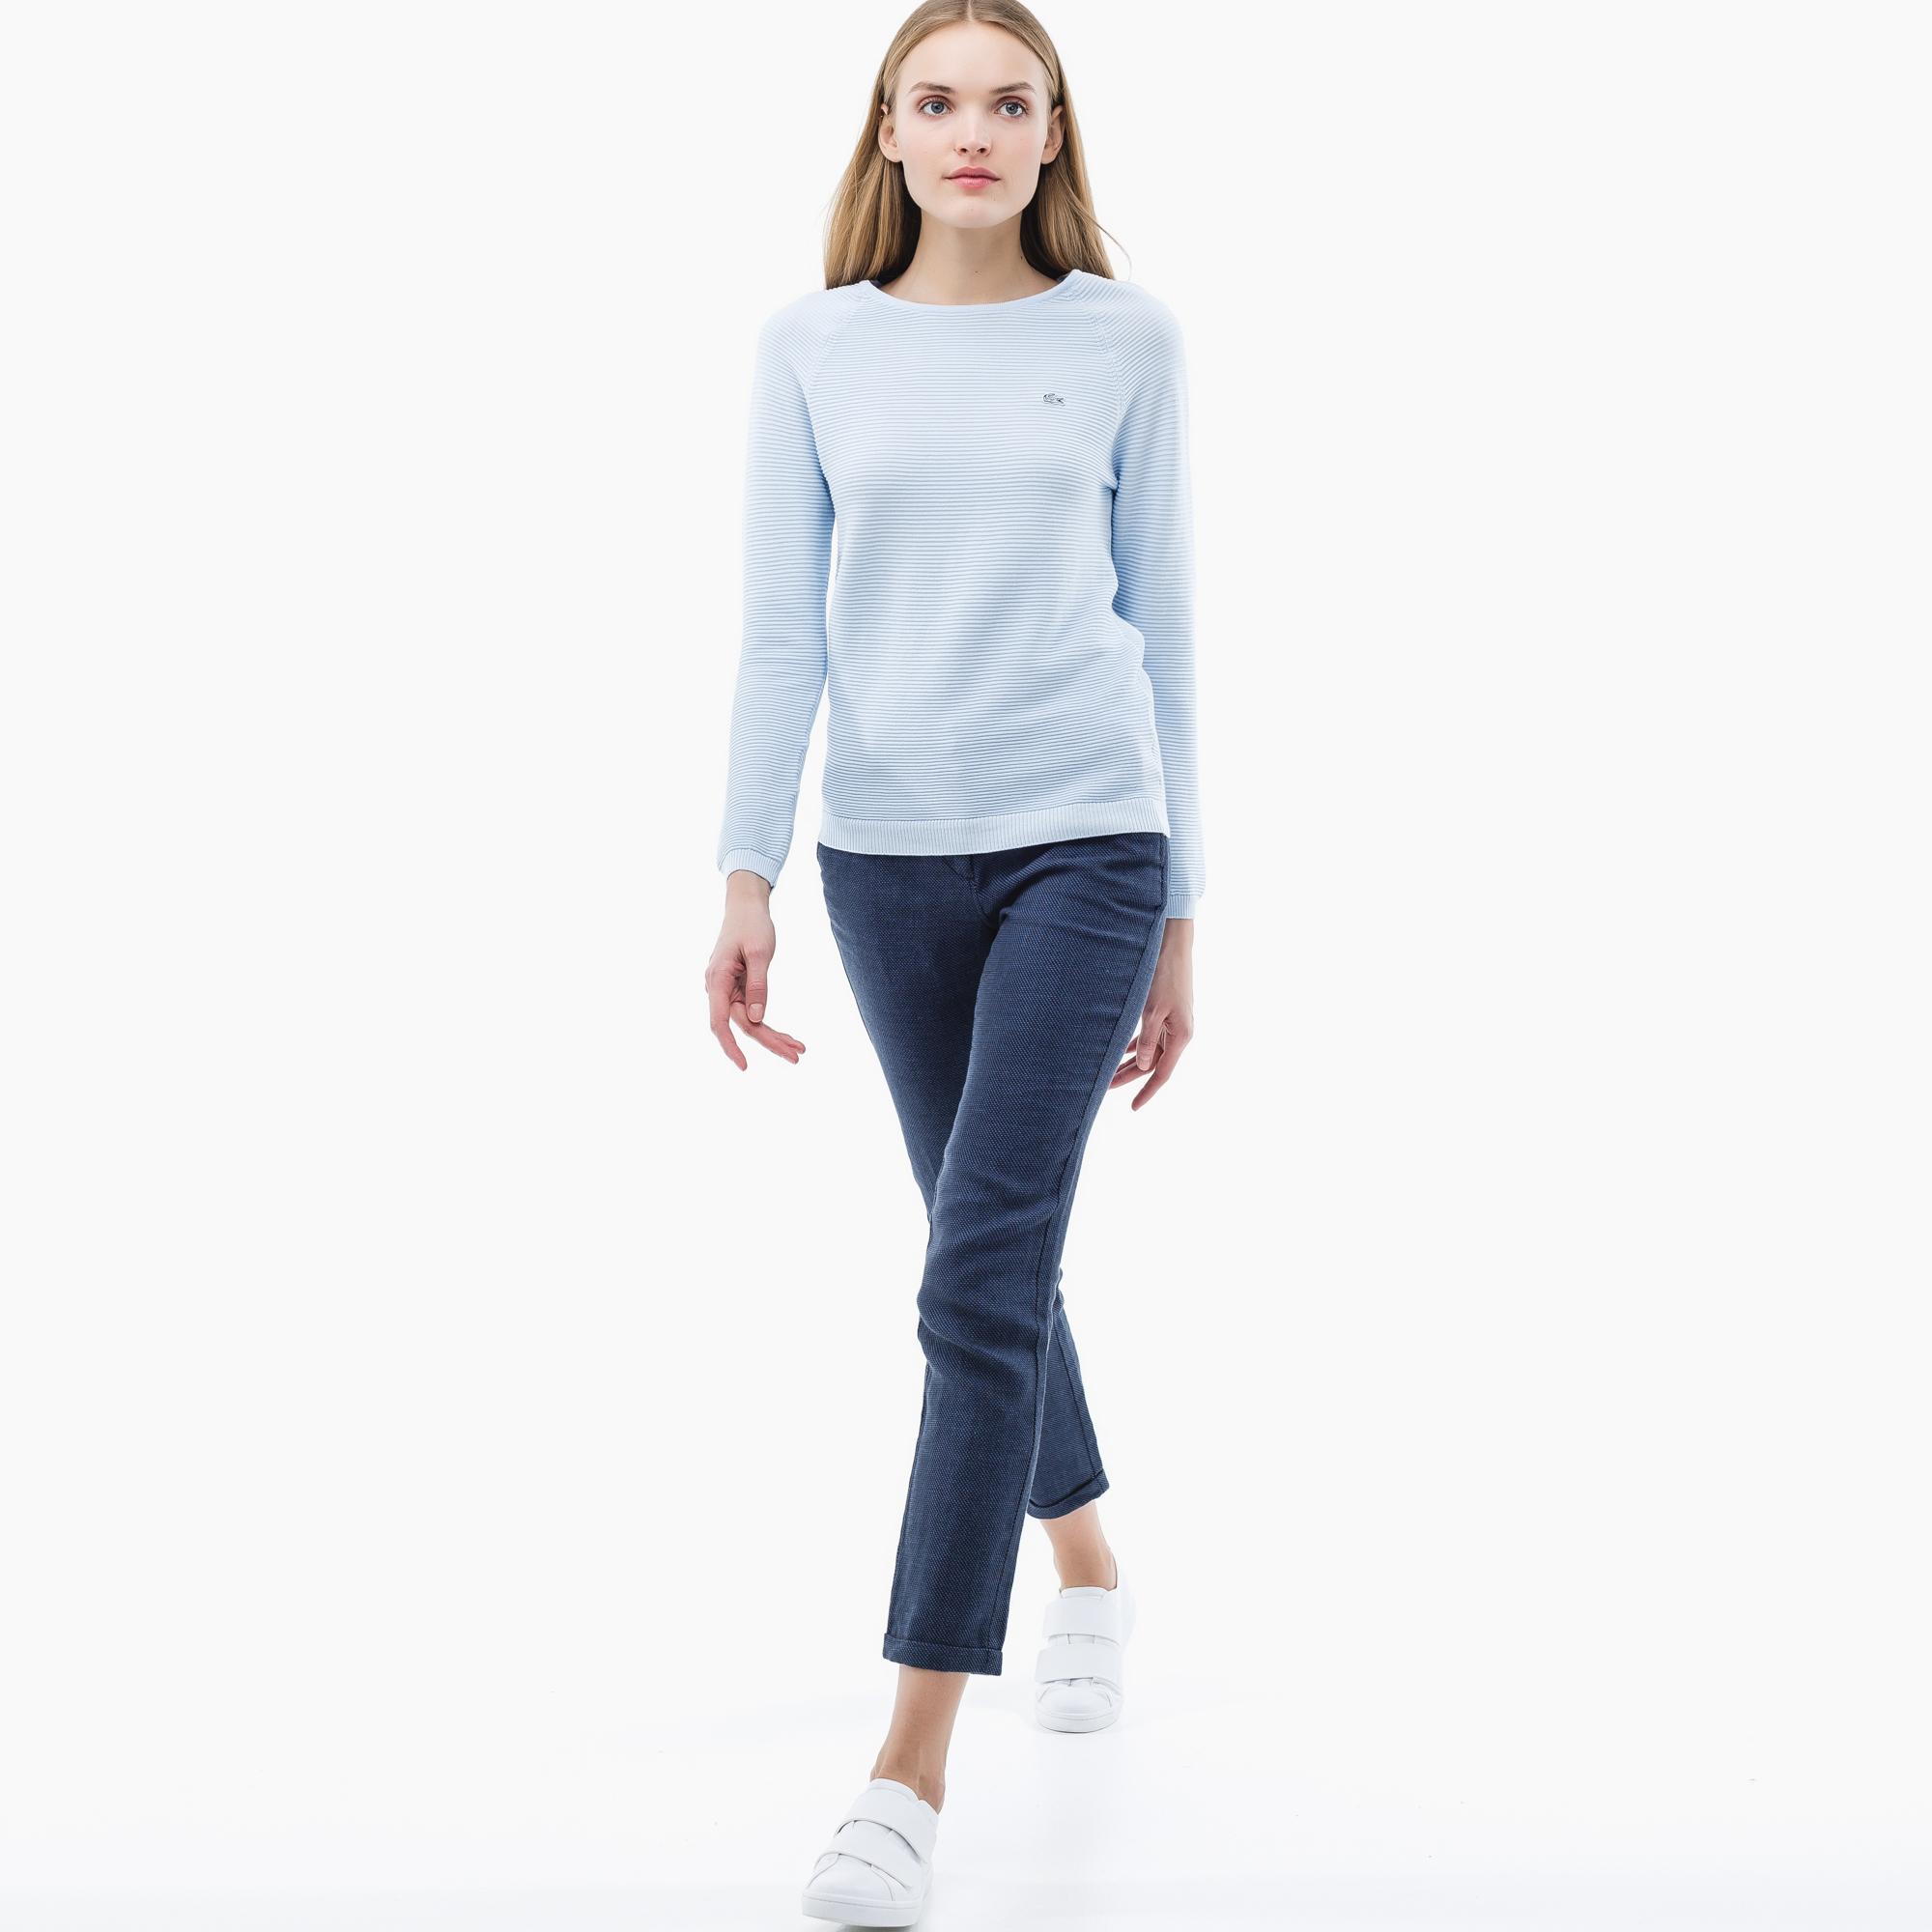 Свитер LacosteСвитеры<br>Детали: женский свитер из хлопка  \ Материал: 100% хлопок \ Страна производства: Турция